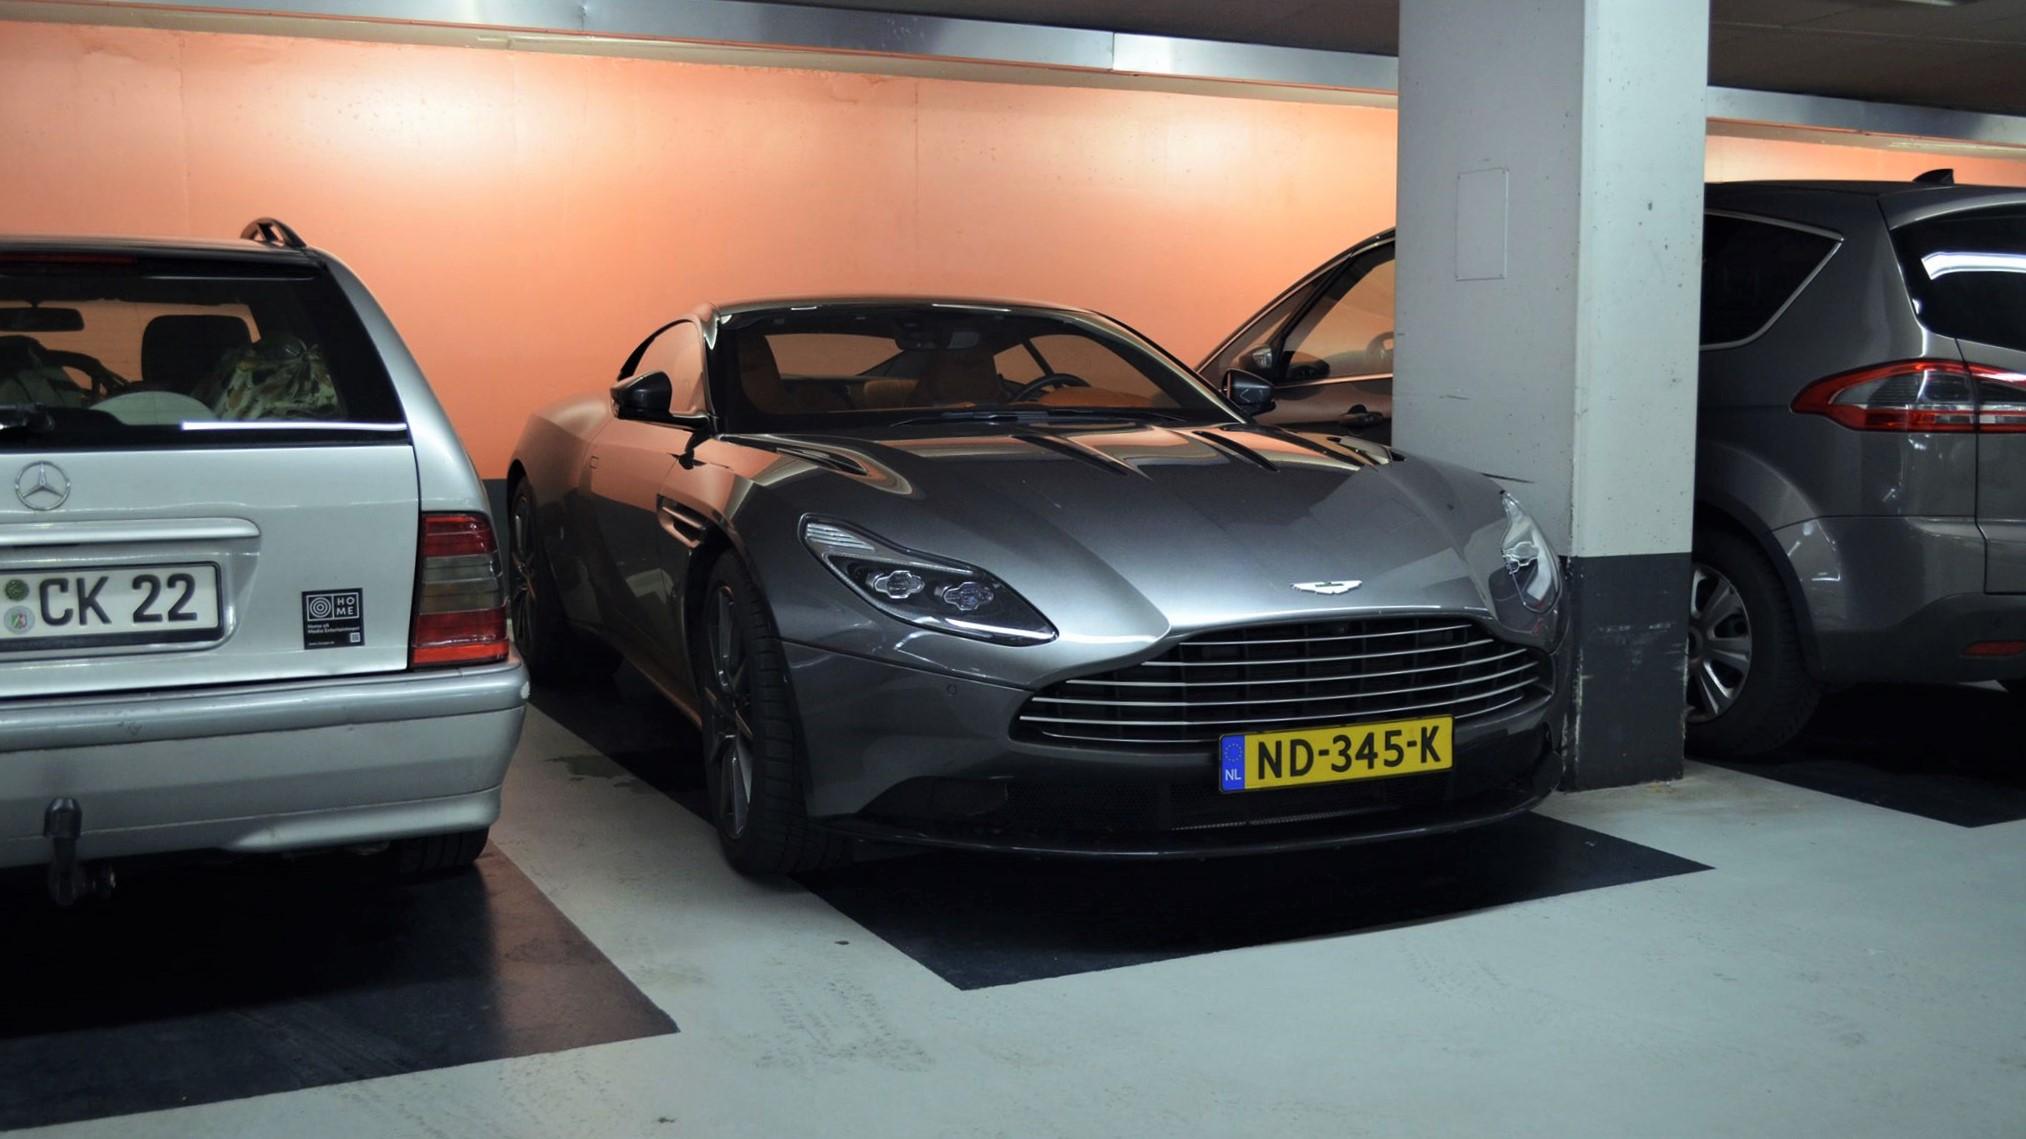 Aston Martin DB11 - ND-345-K (NL)